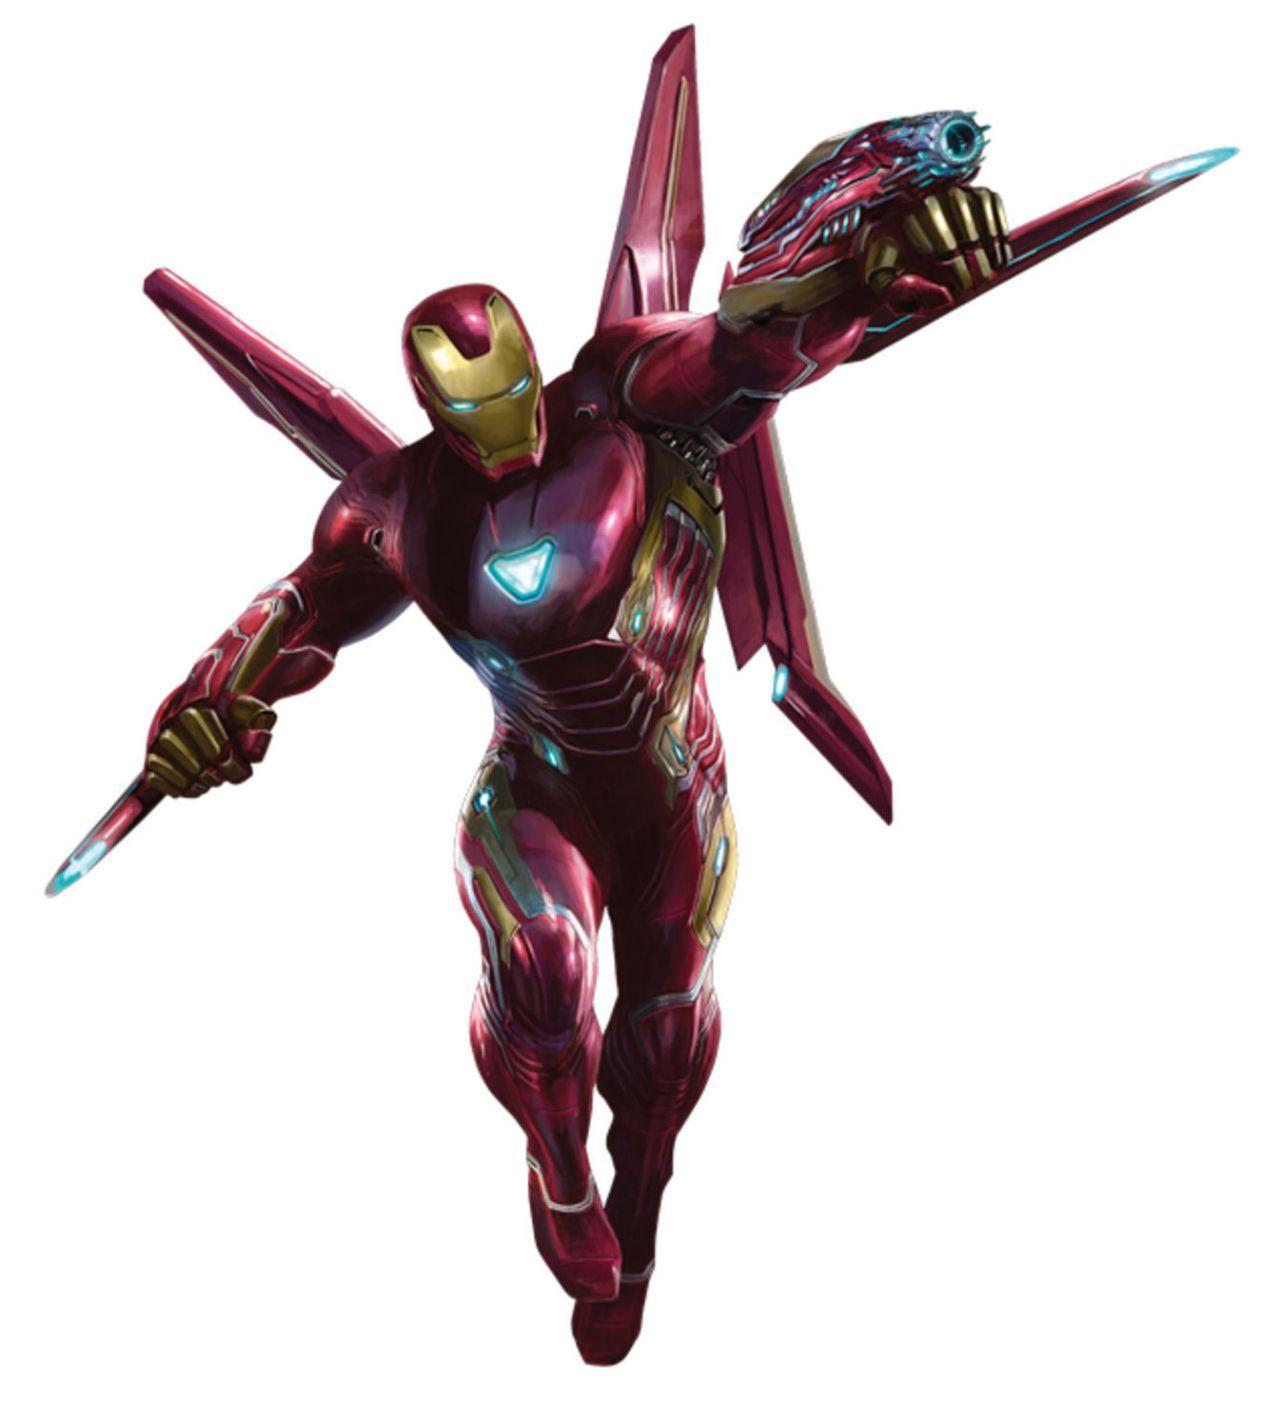 Avengers Infinity War Promo Art - Iron Man Bleeding Edge Armor